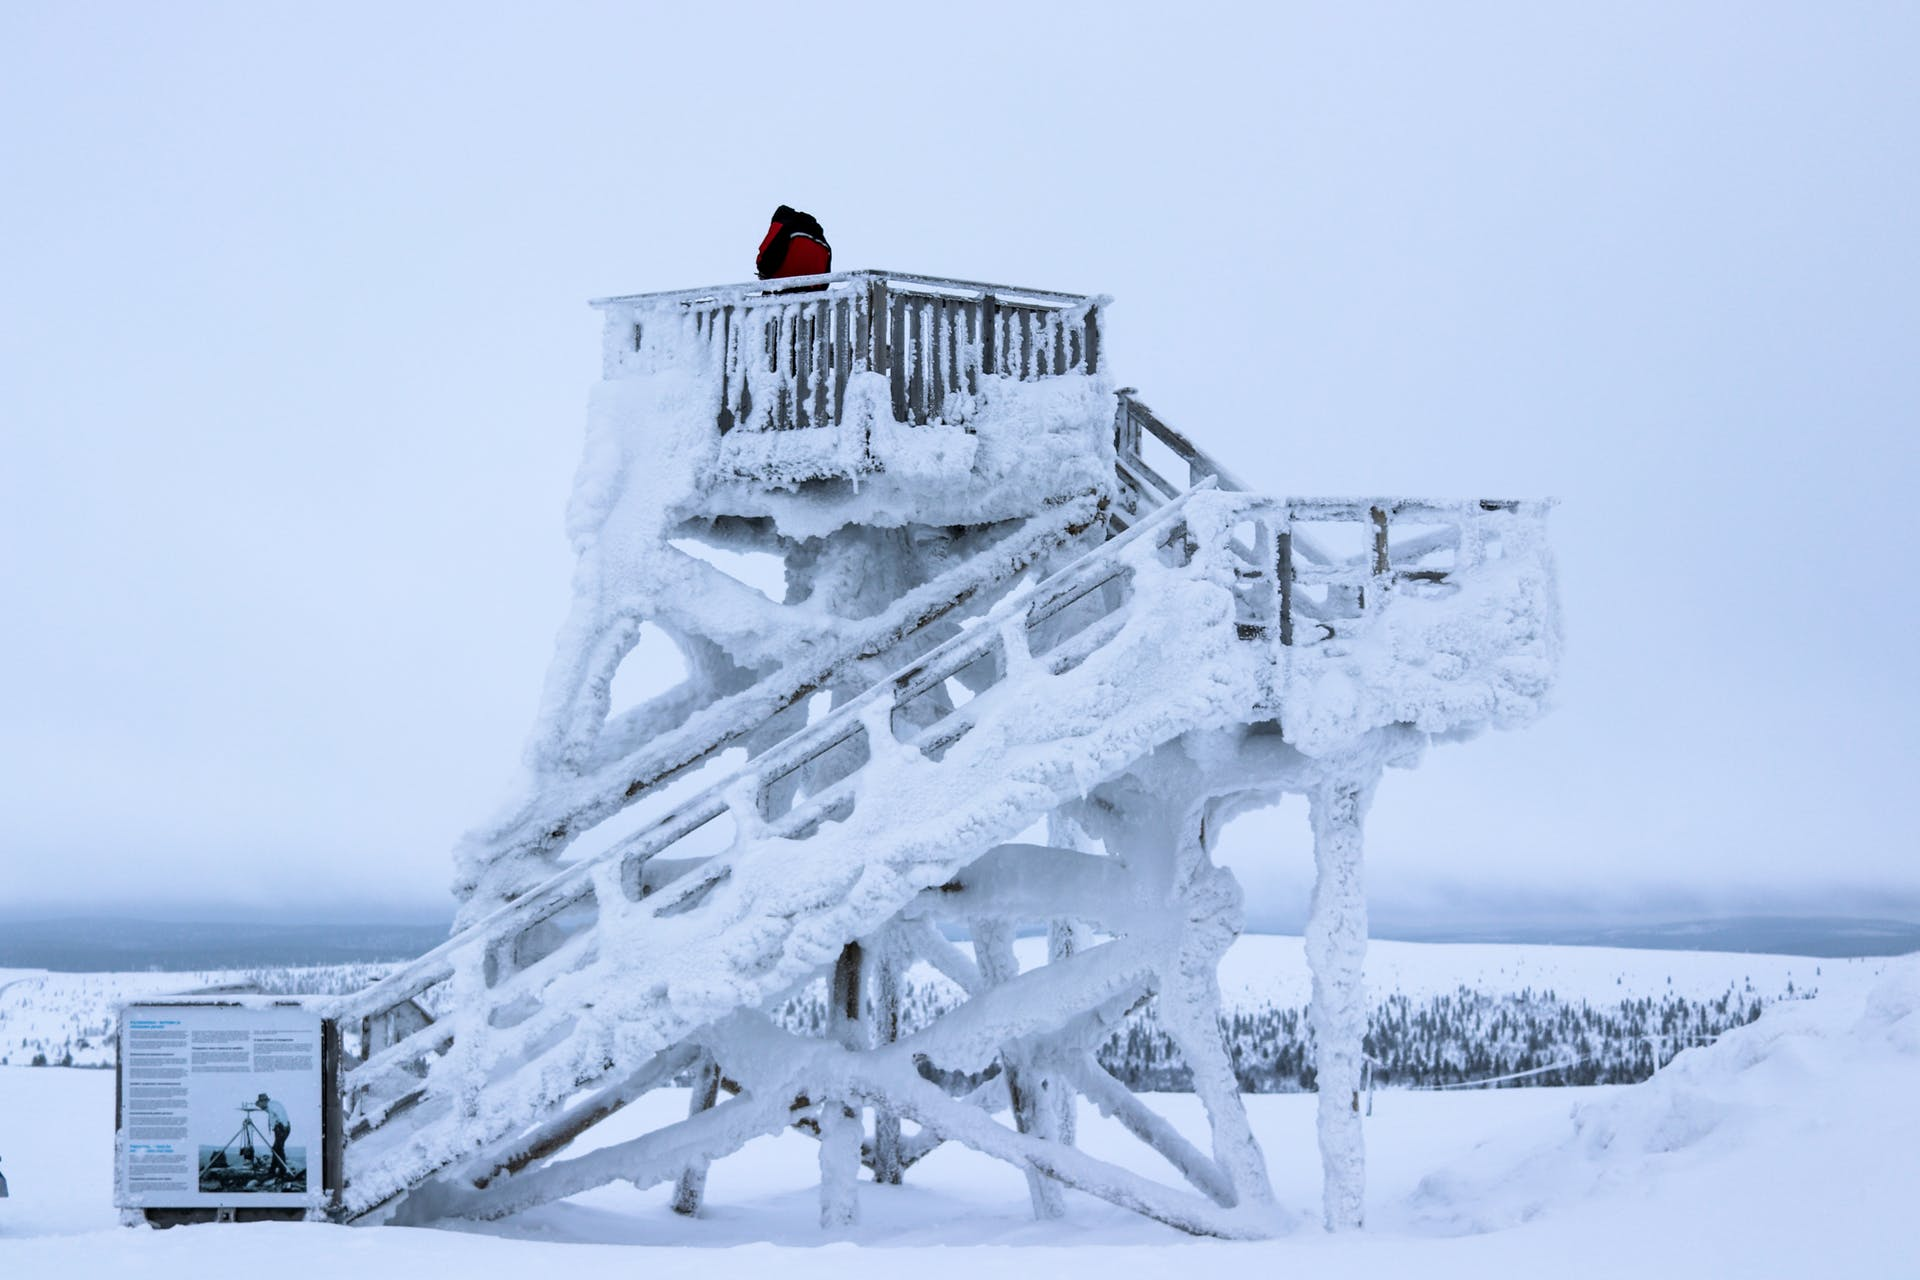 finland lapland snow cold frozen winter